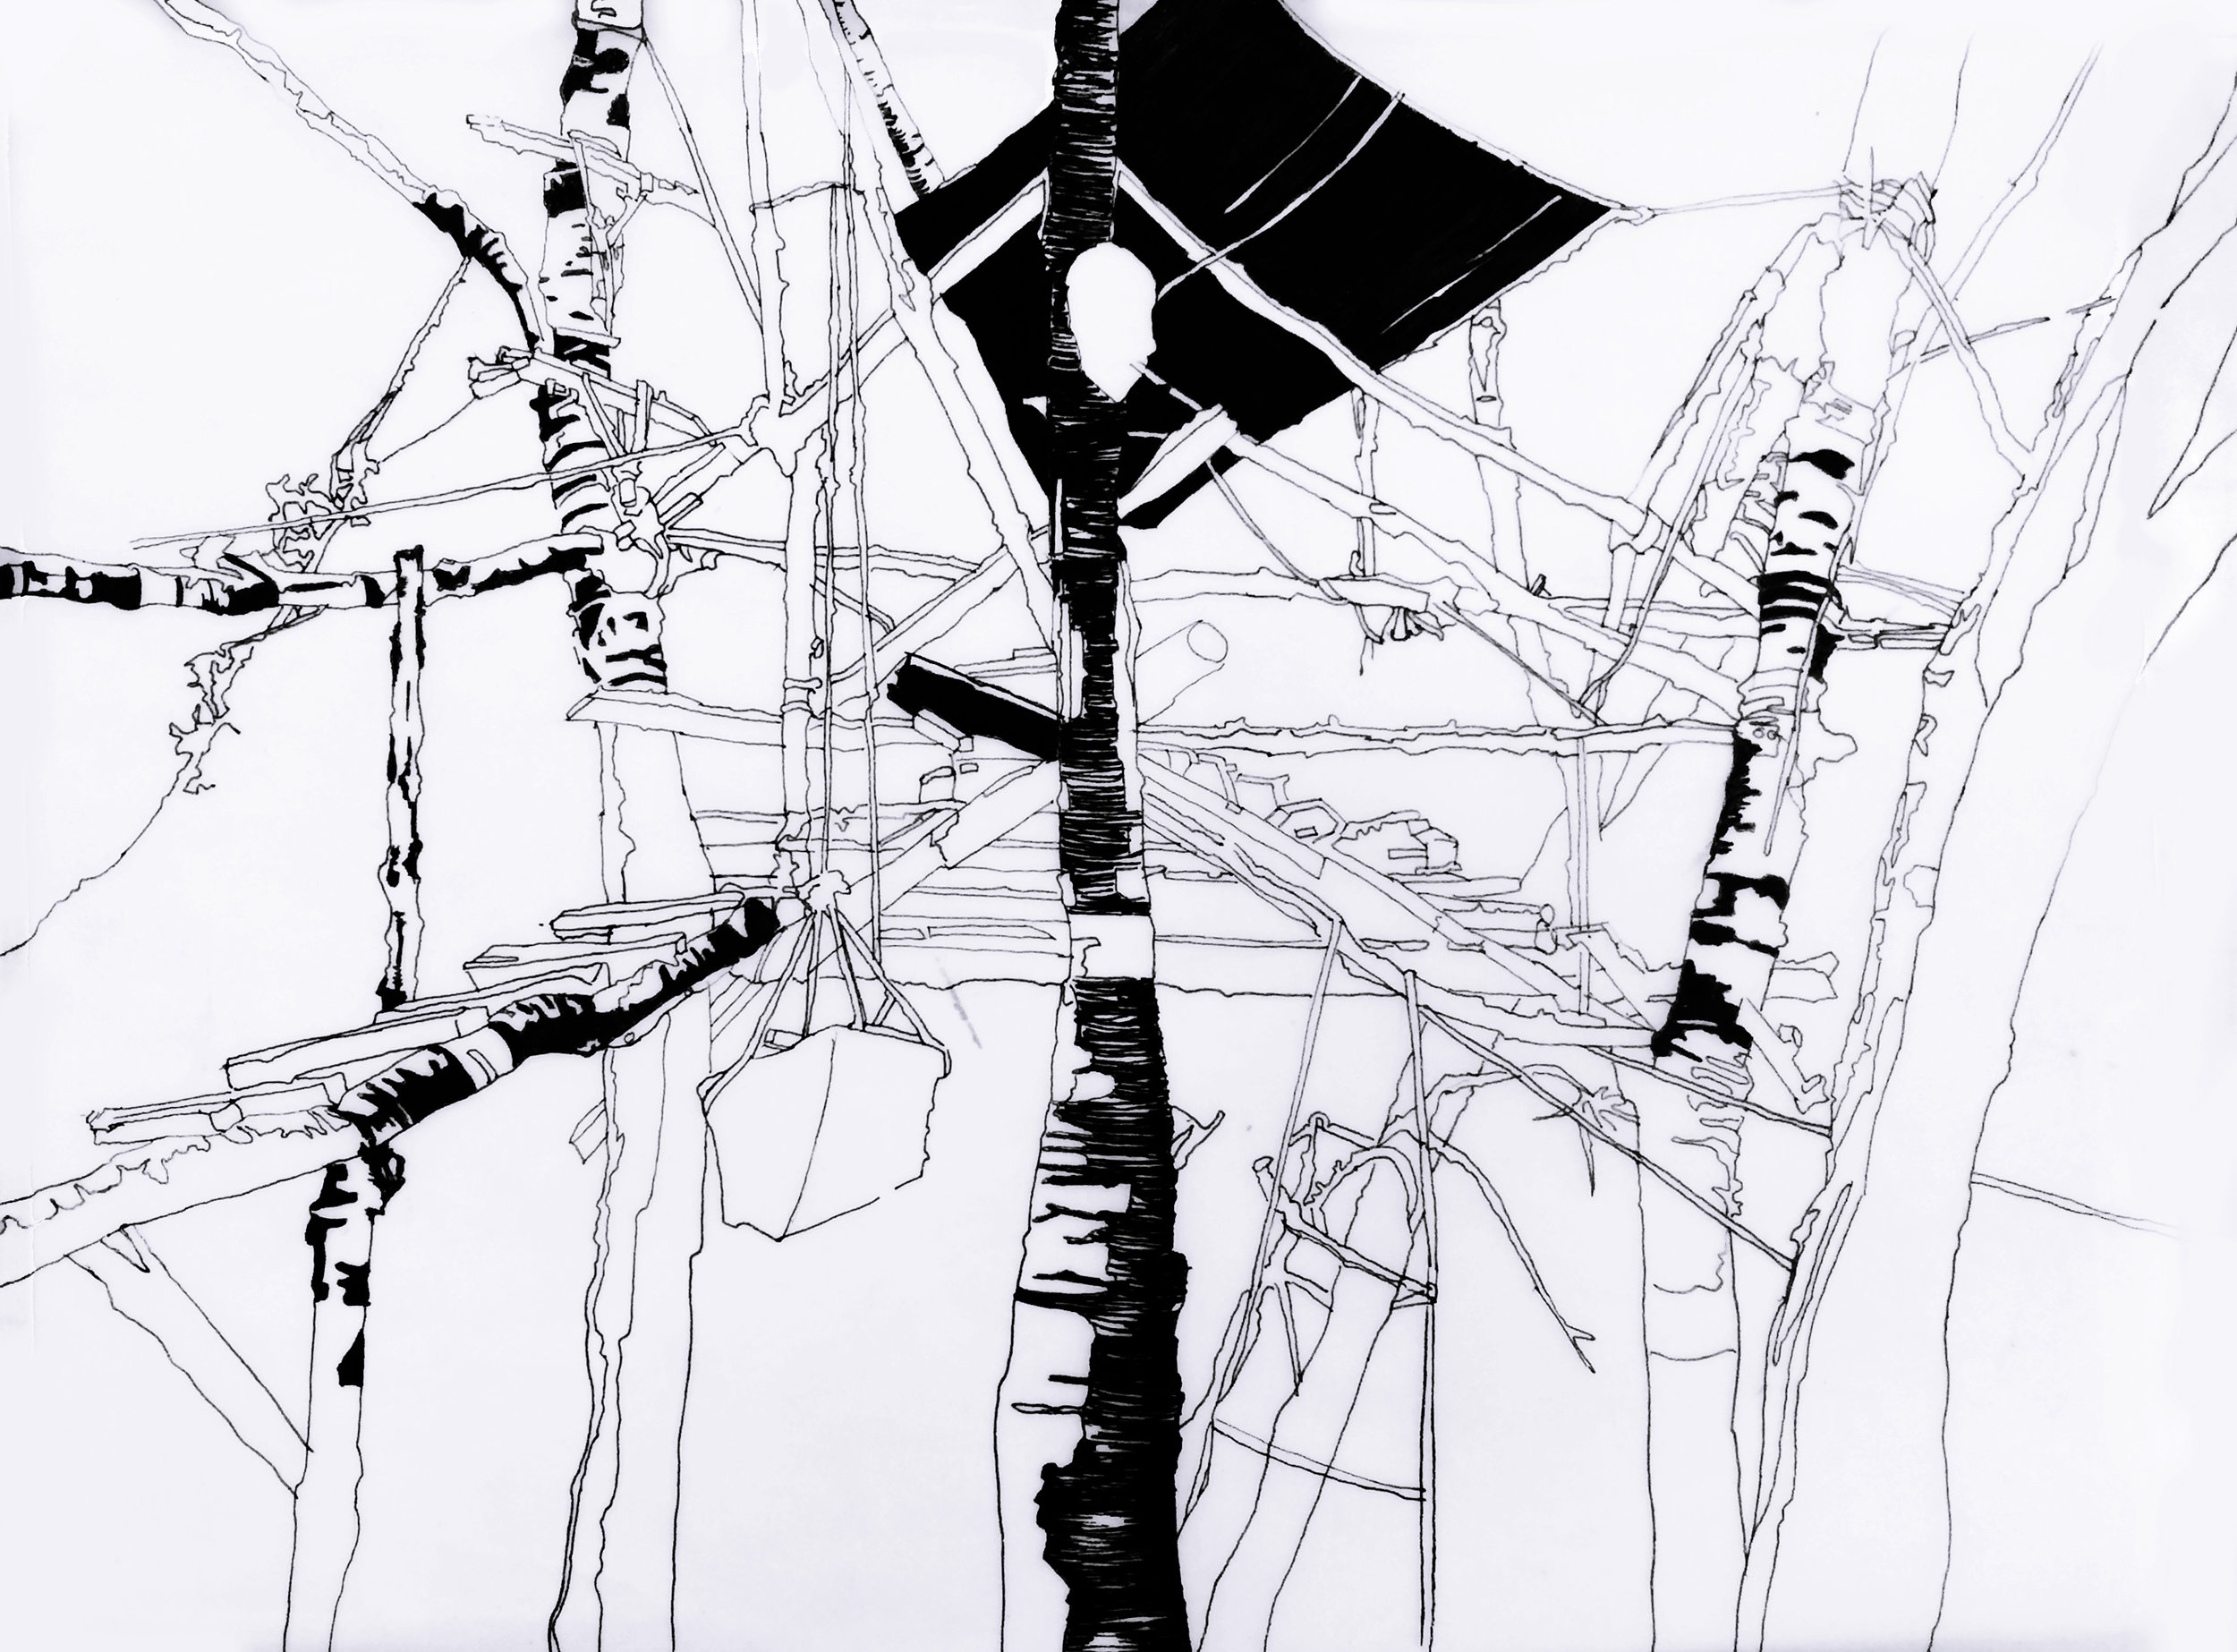 Badlands Treehouse (sketch), 2014, ink on vellum, 8 1/2 X 11 in.